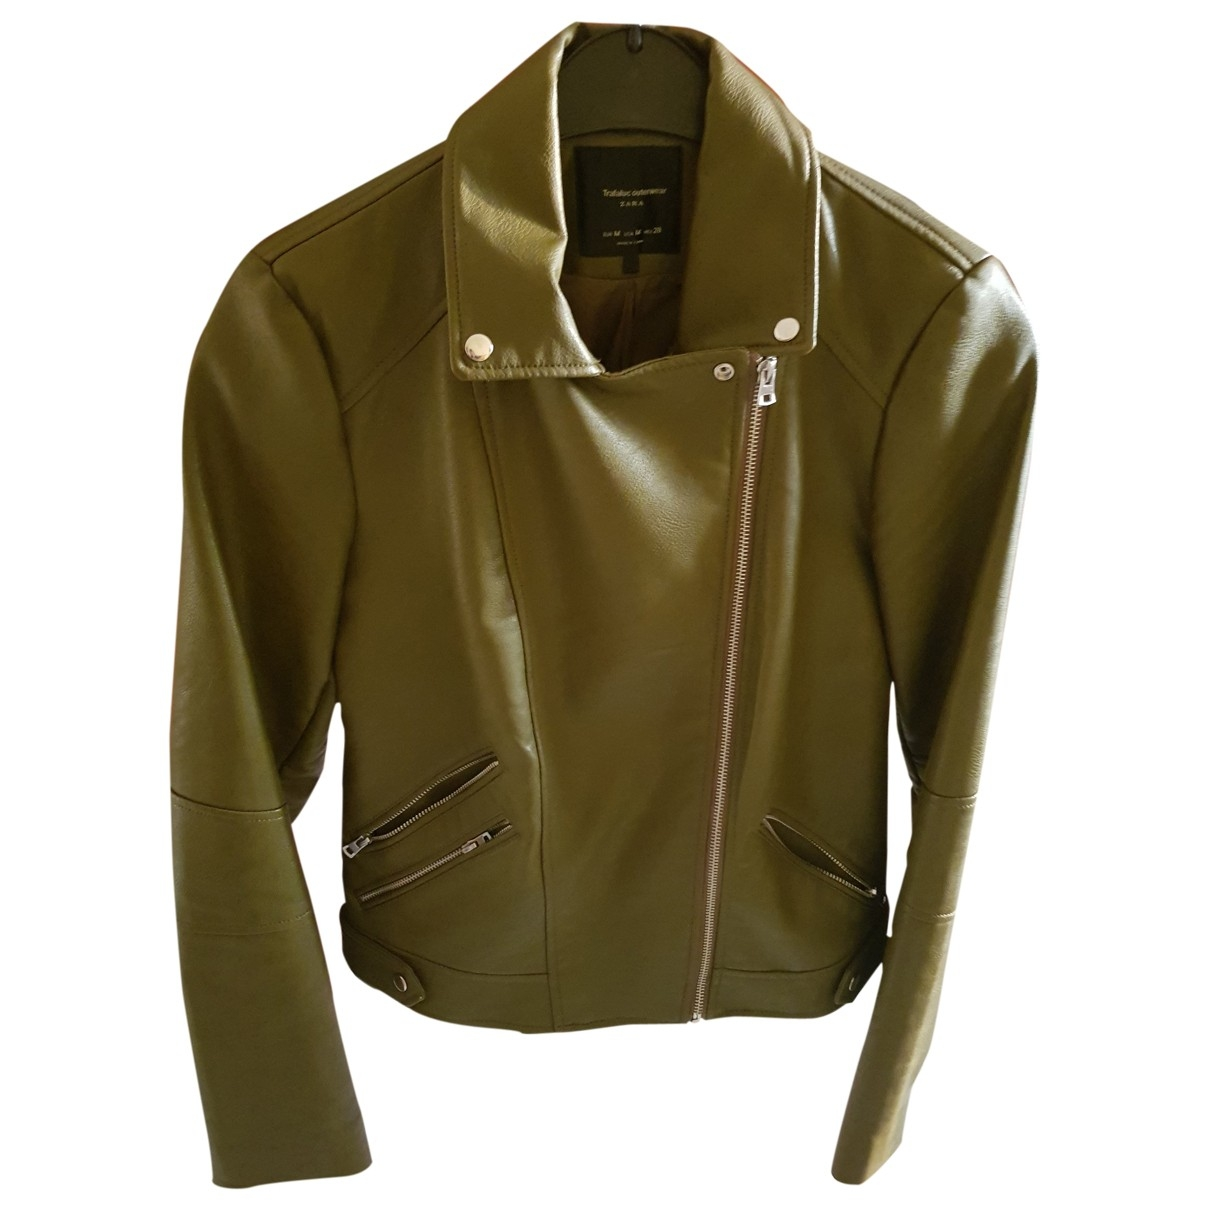 Zara \N Green jacket for Women M International